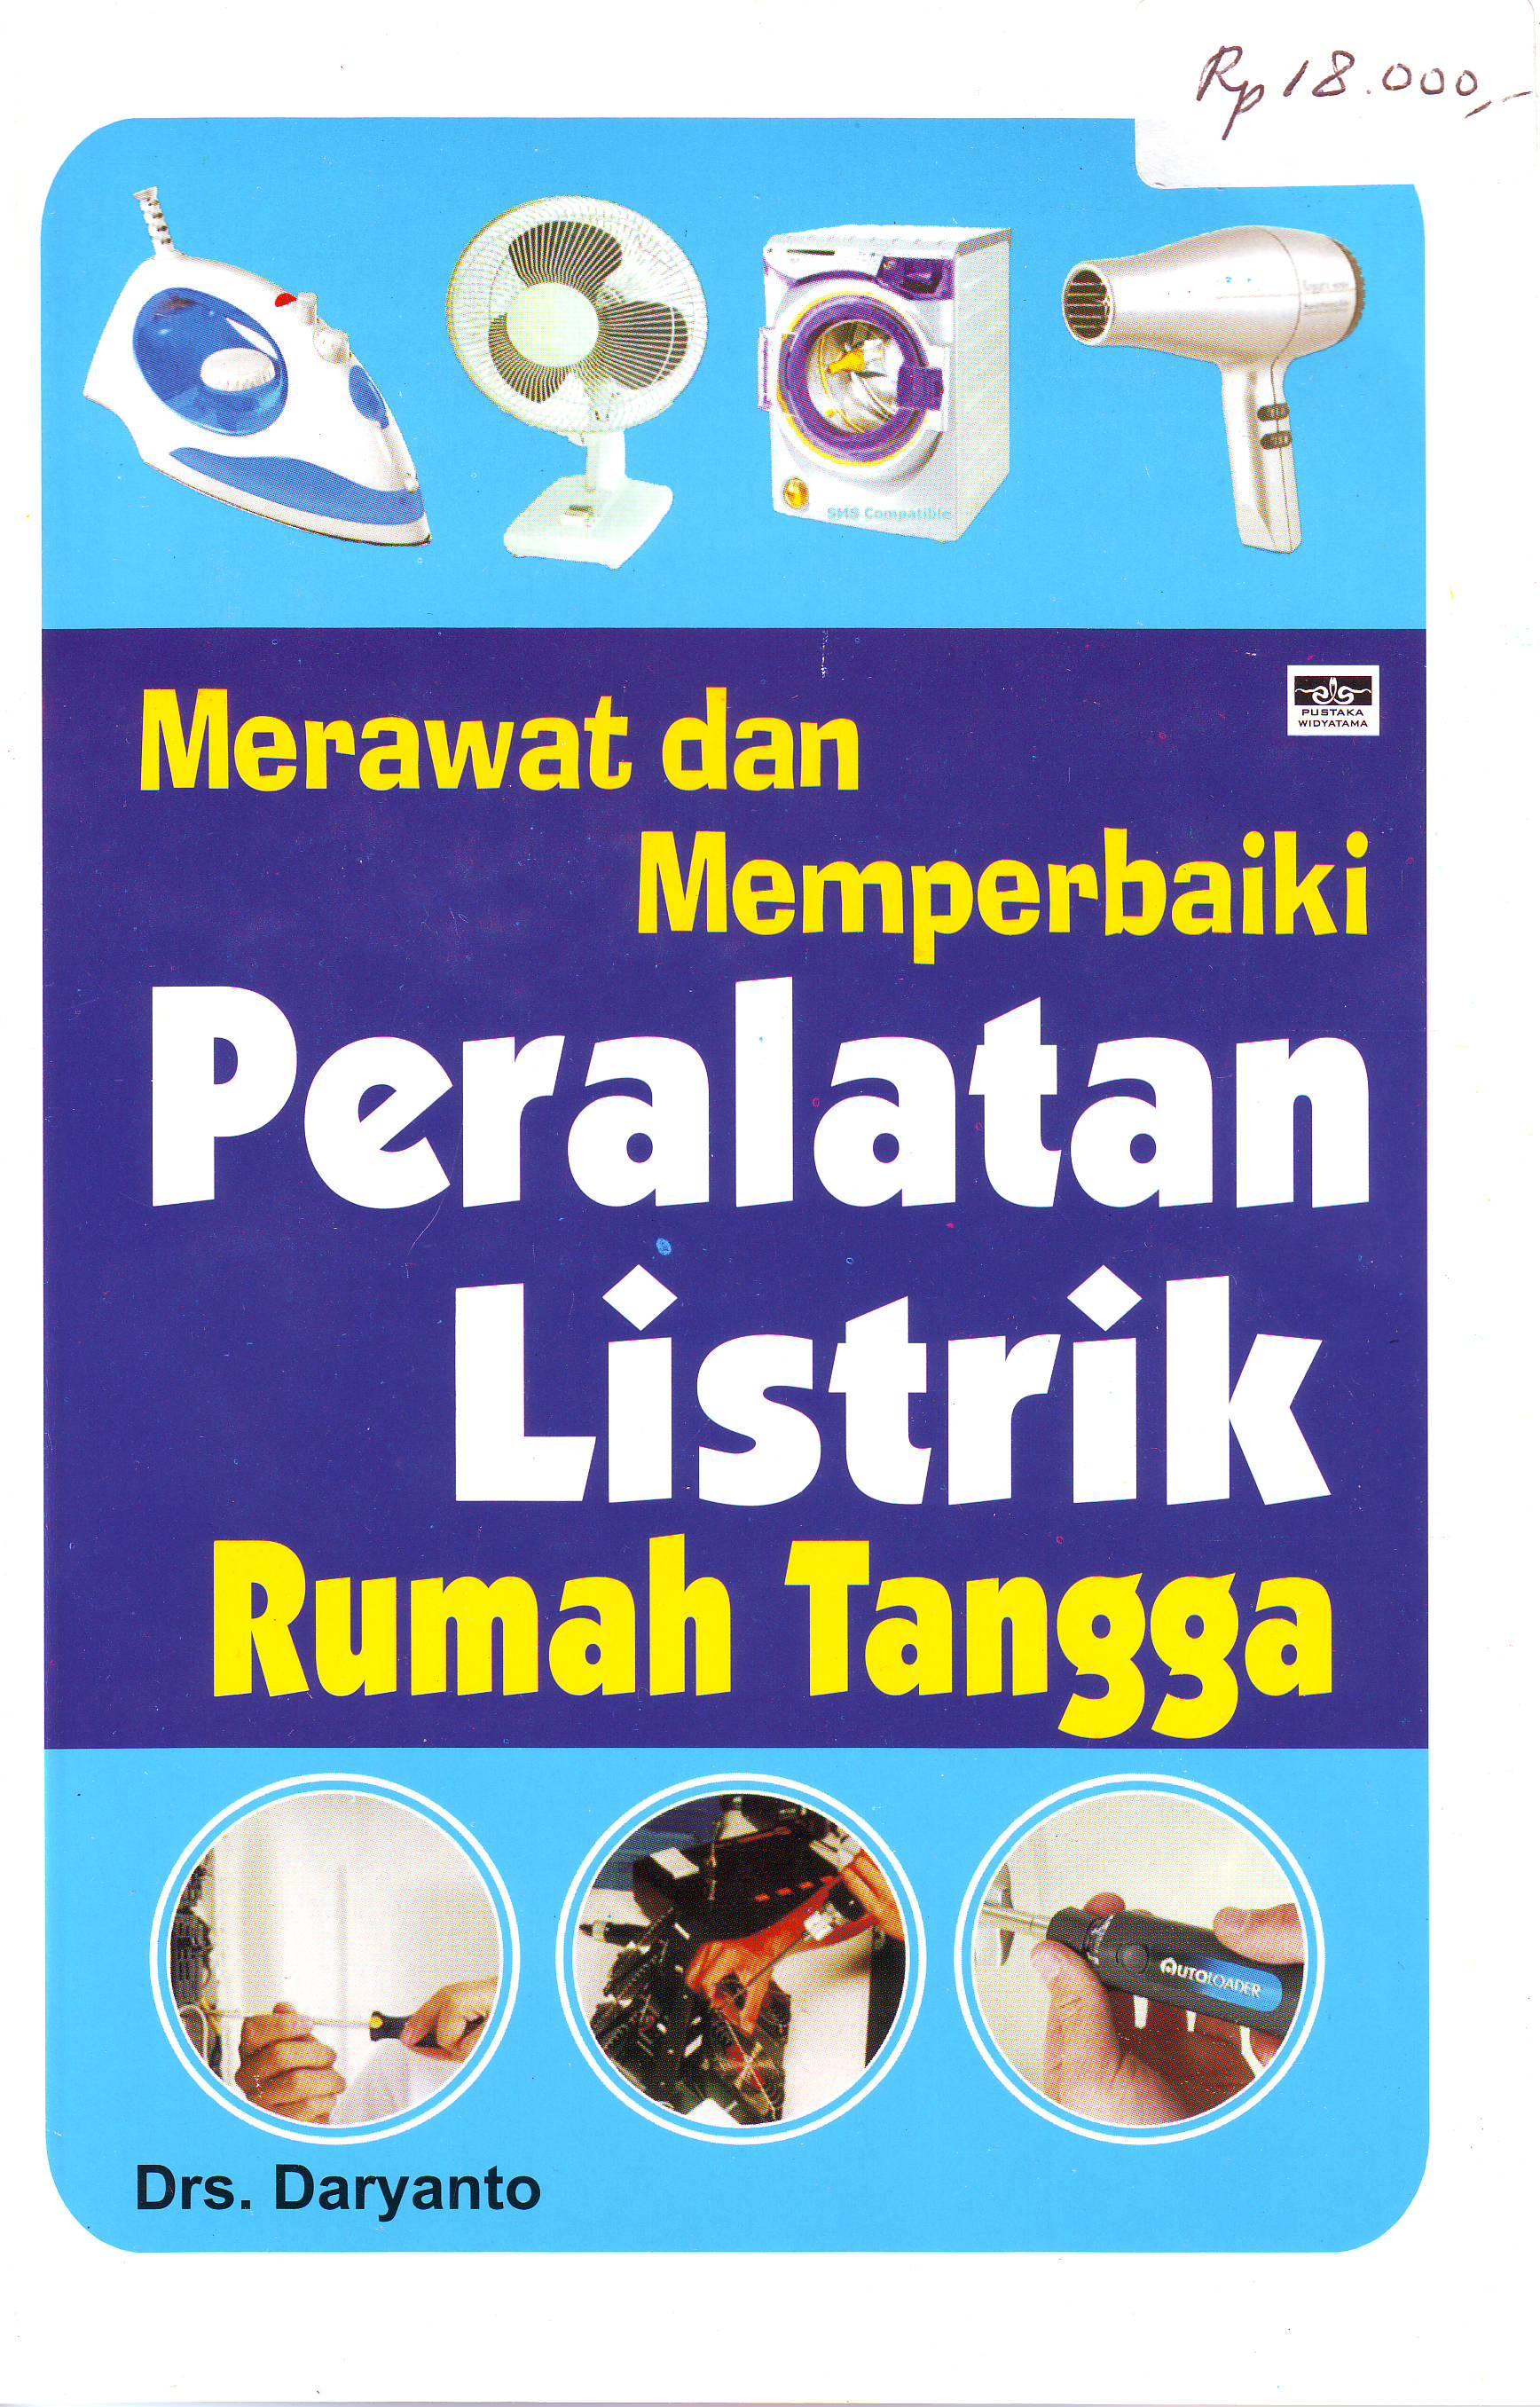 buku perawatan alat listrik rumah tangga